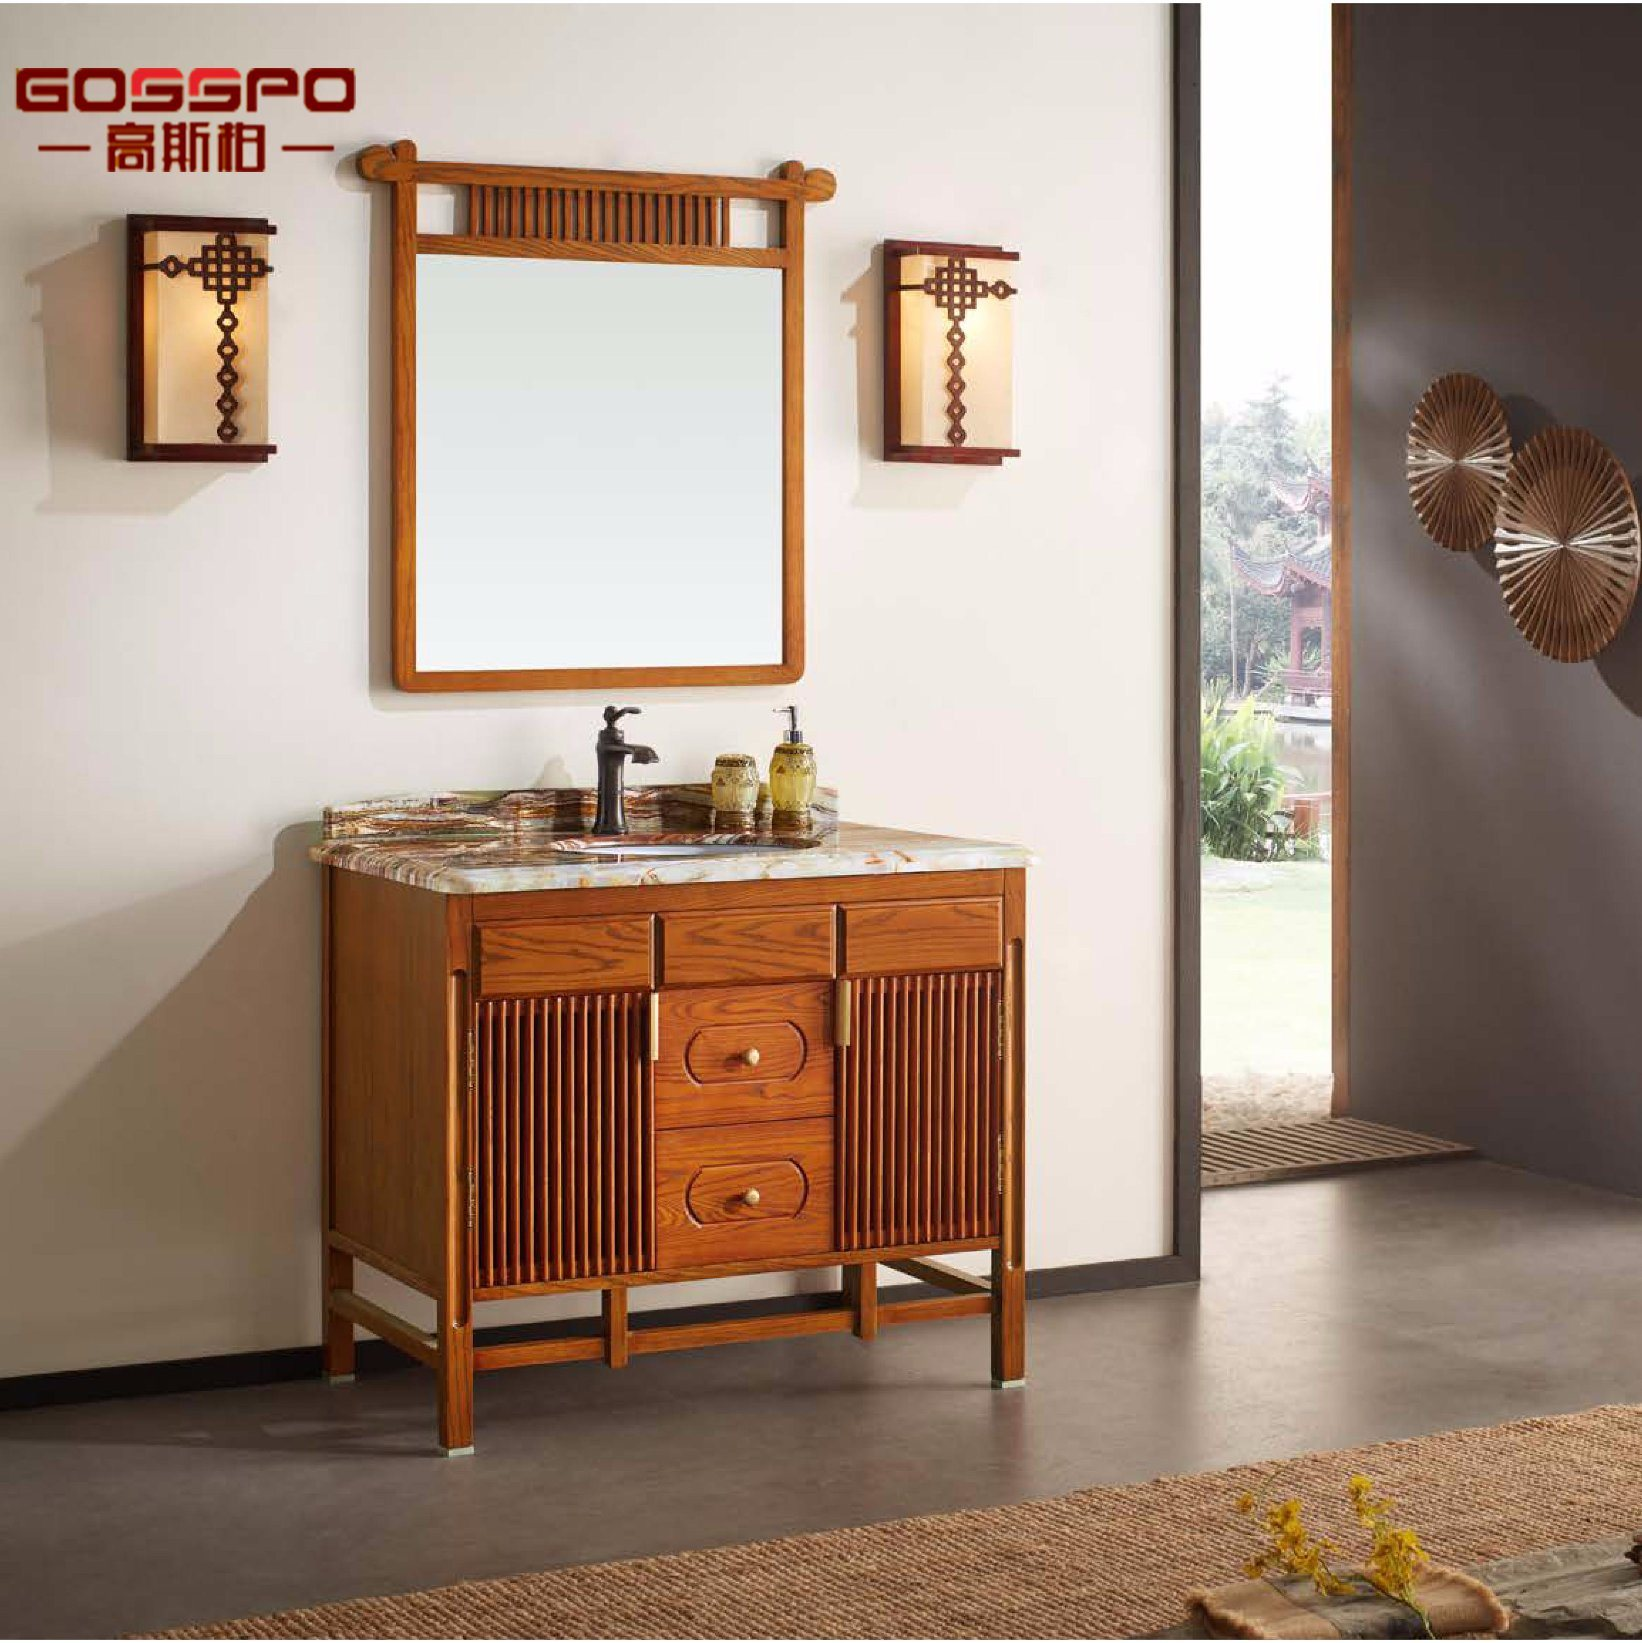 Cabinet de salle de bains en bois massif en acajou en style espagnol ...